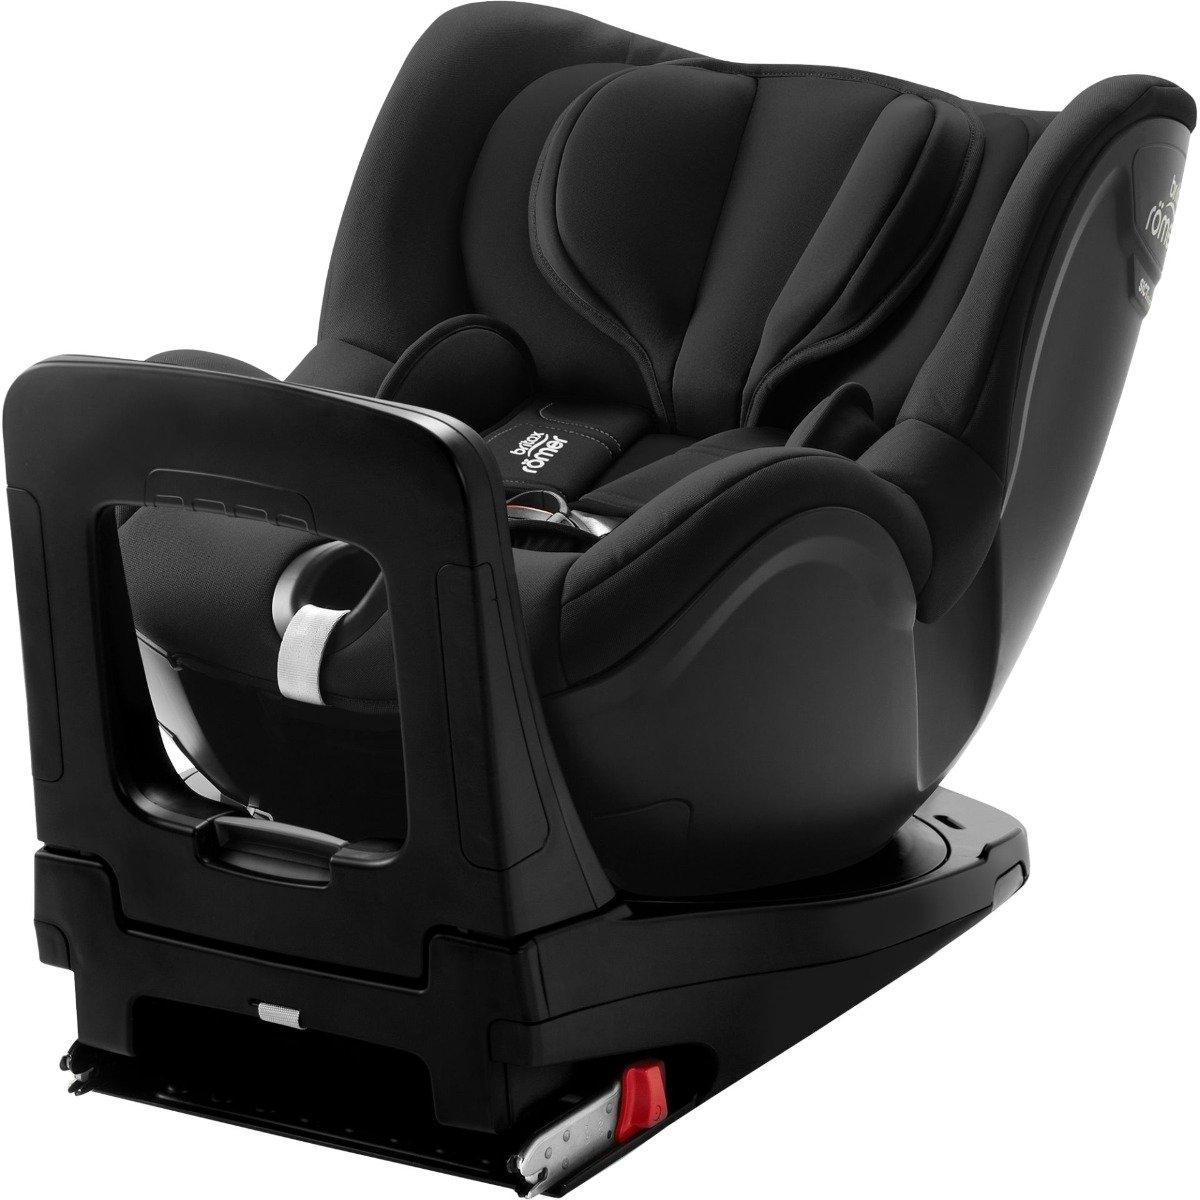 Scaun Auto Cu Isofix Britax Romer Dualfix I-size, Rotativ, 40-105 Cm, Cosmos Black